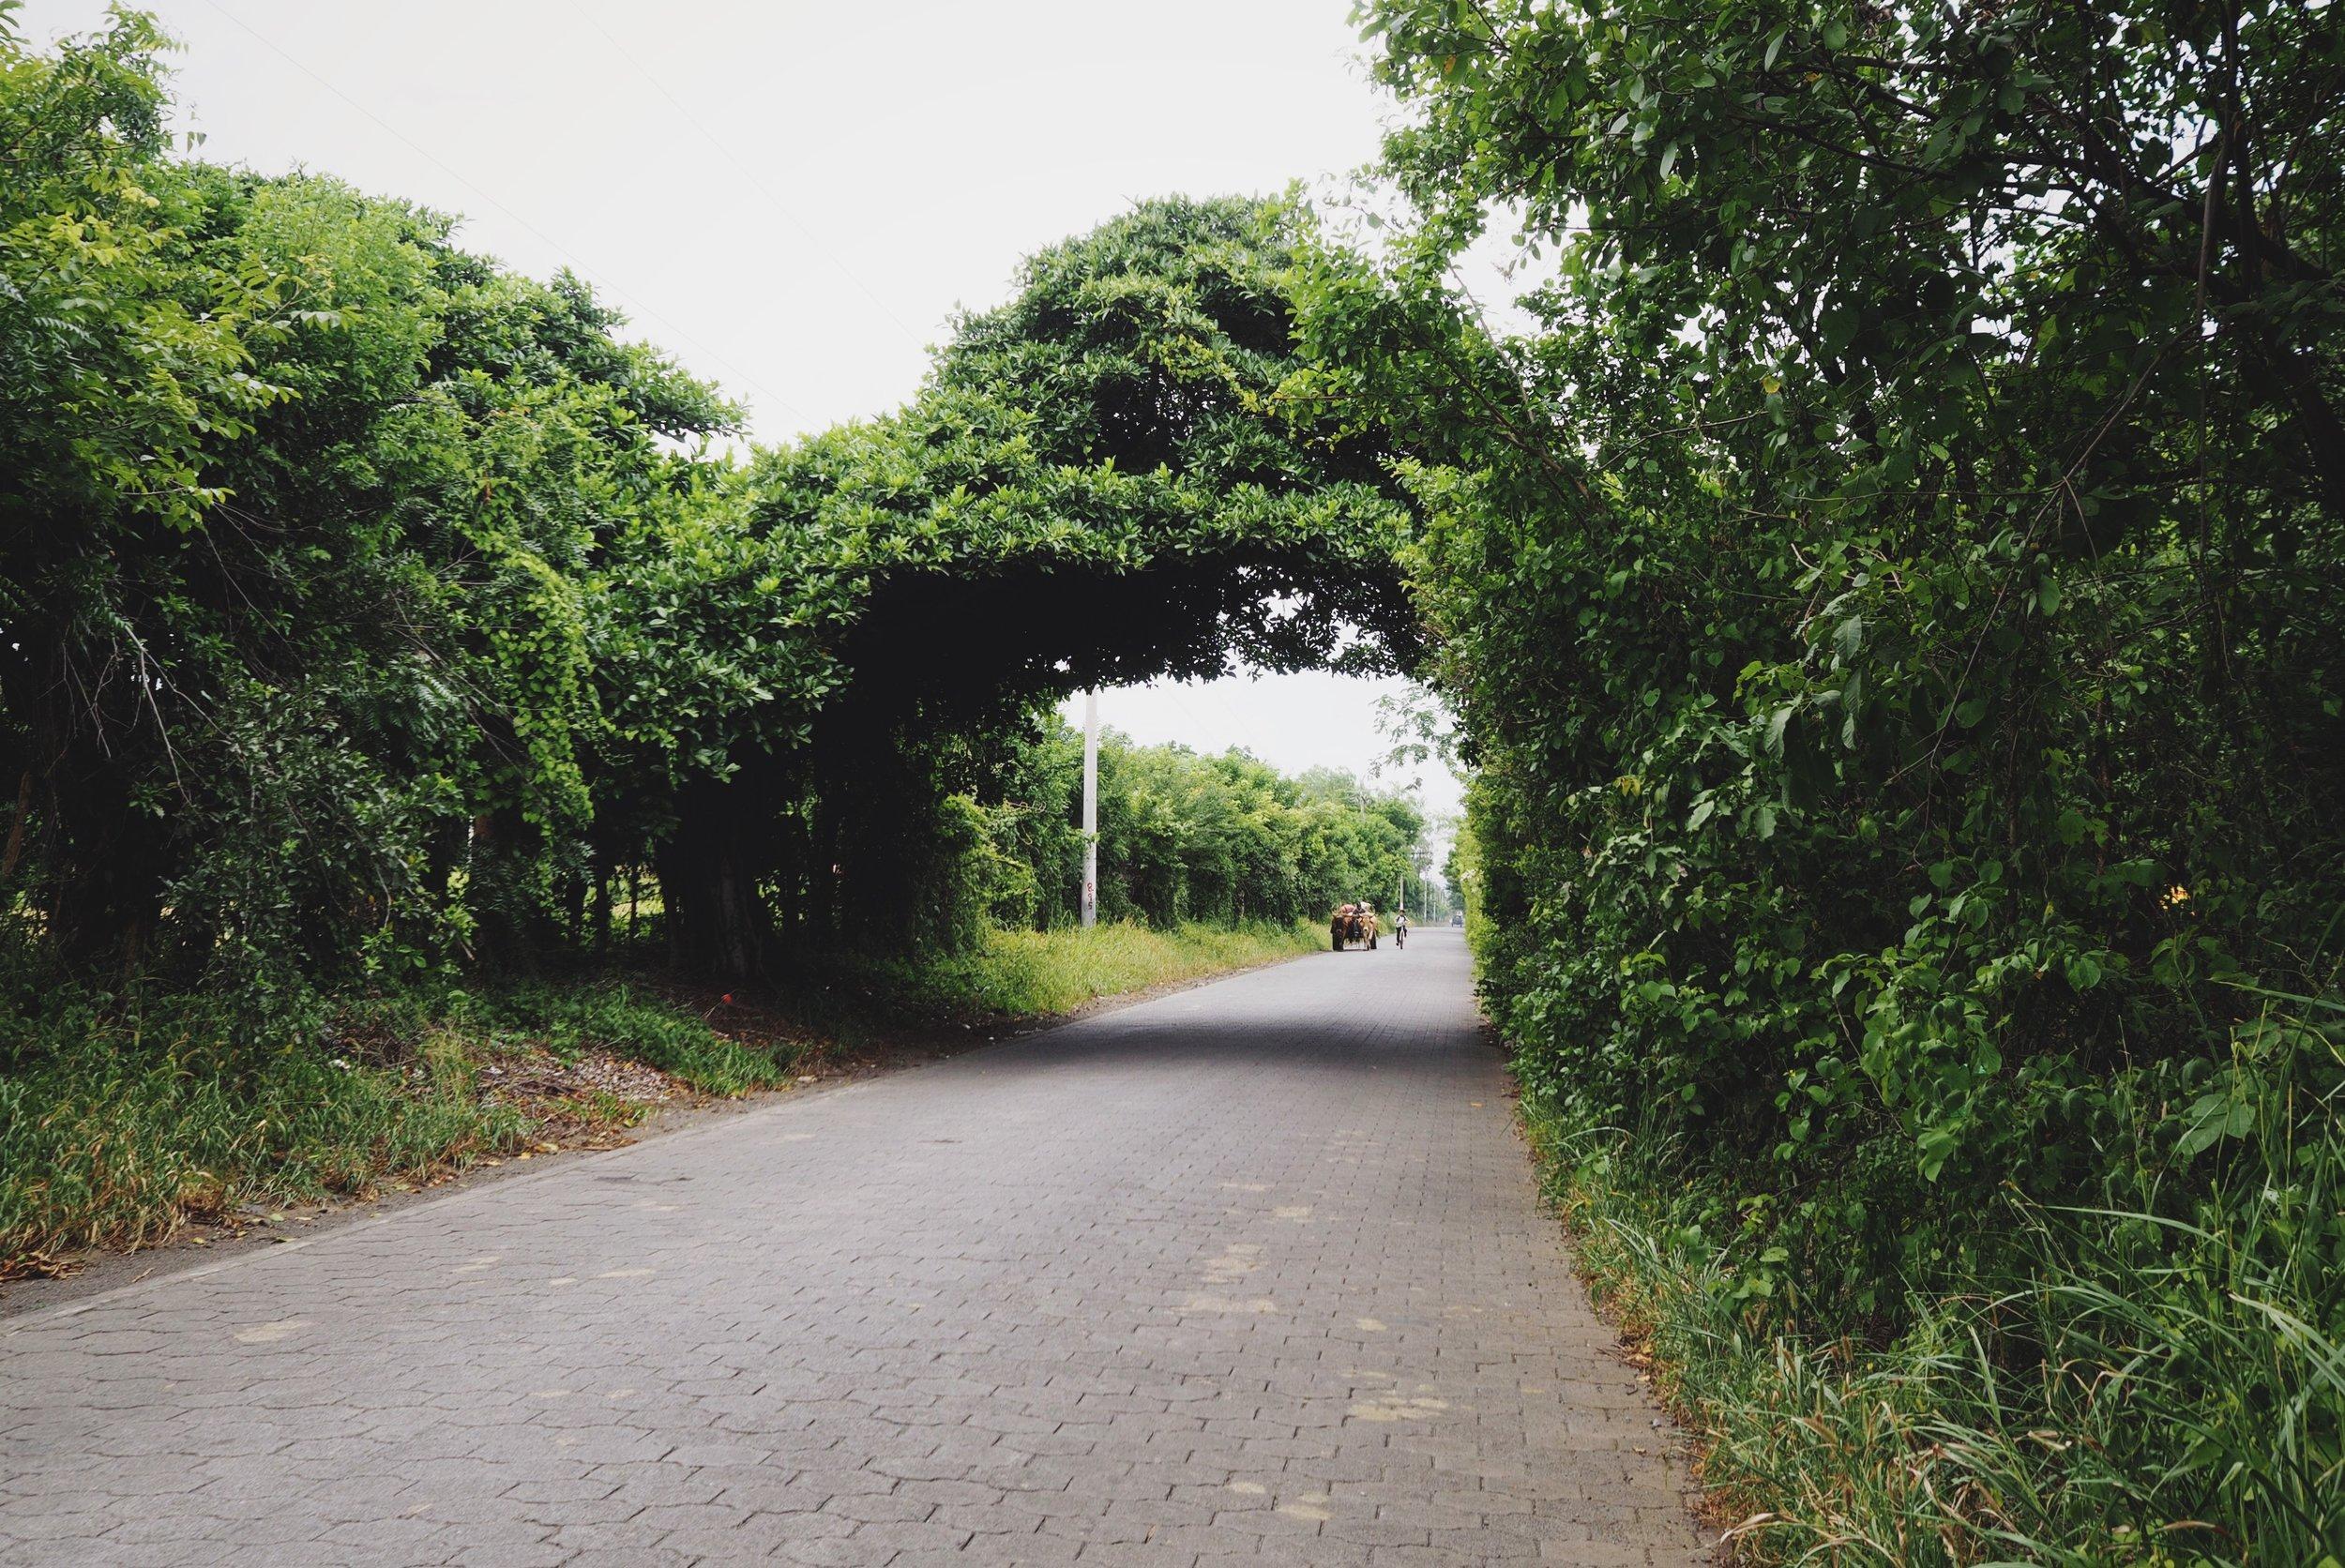 The lush, green roads to Masaya